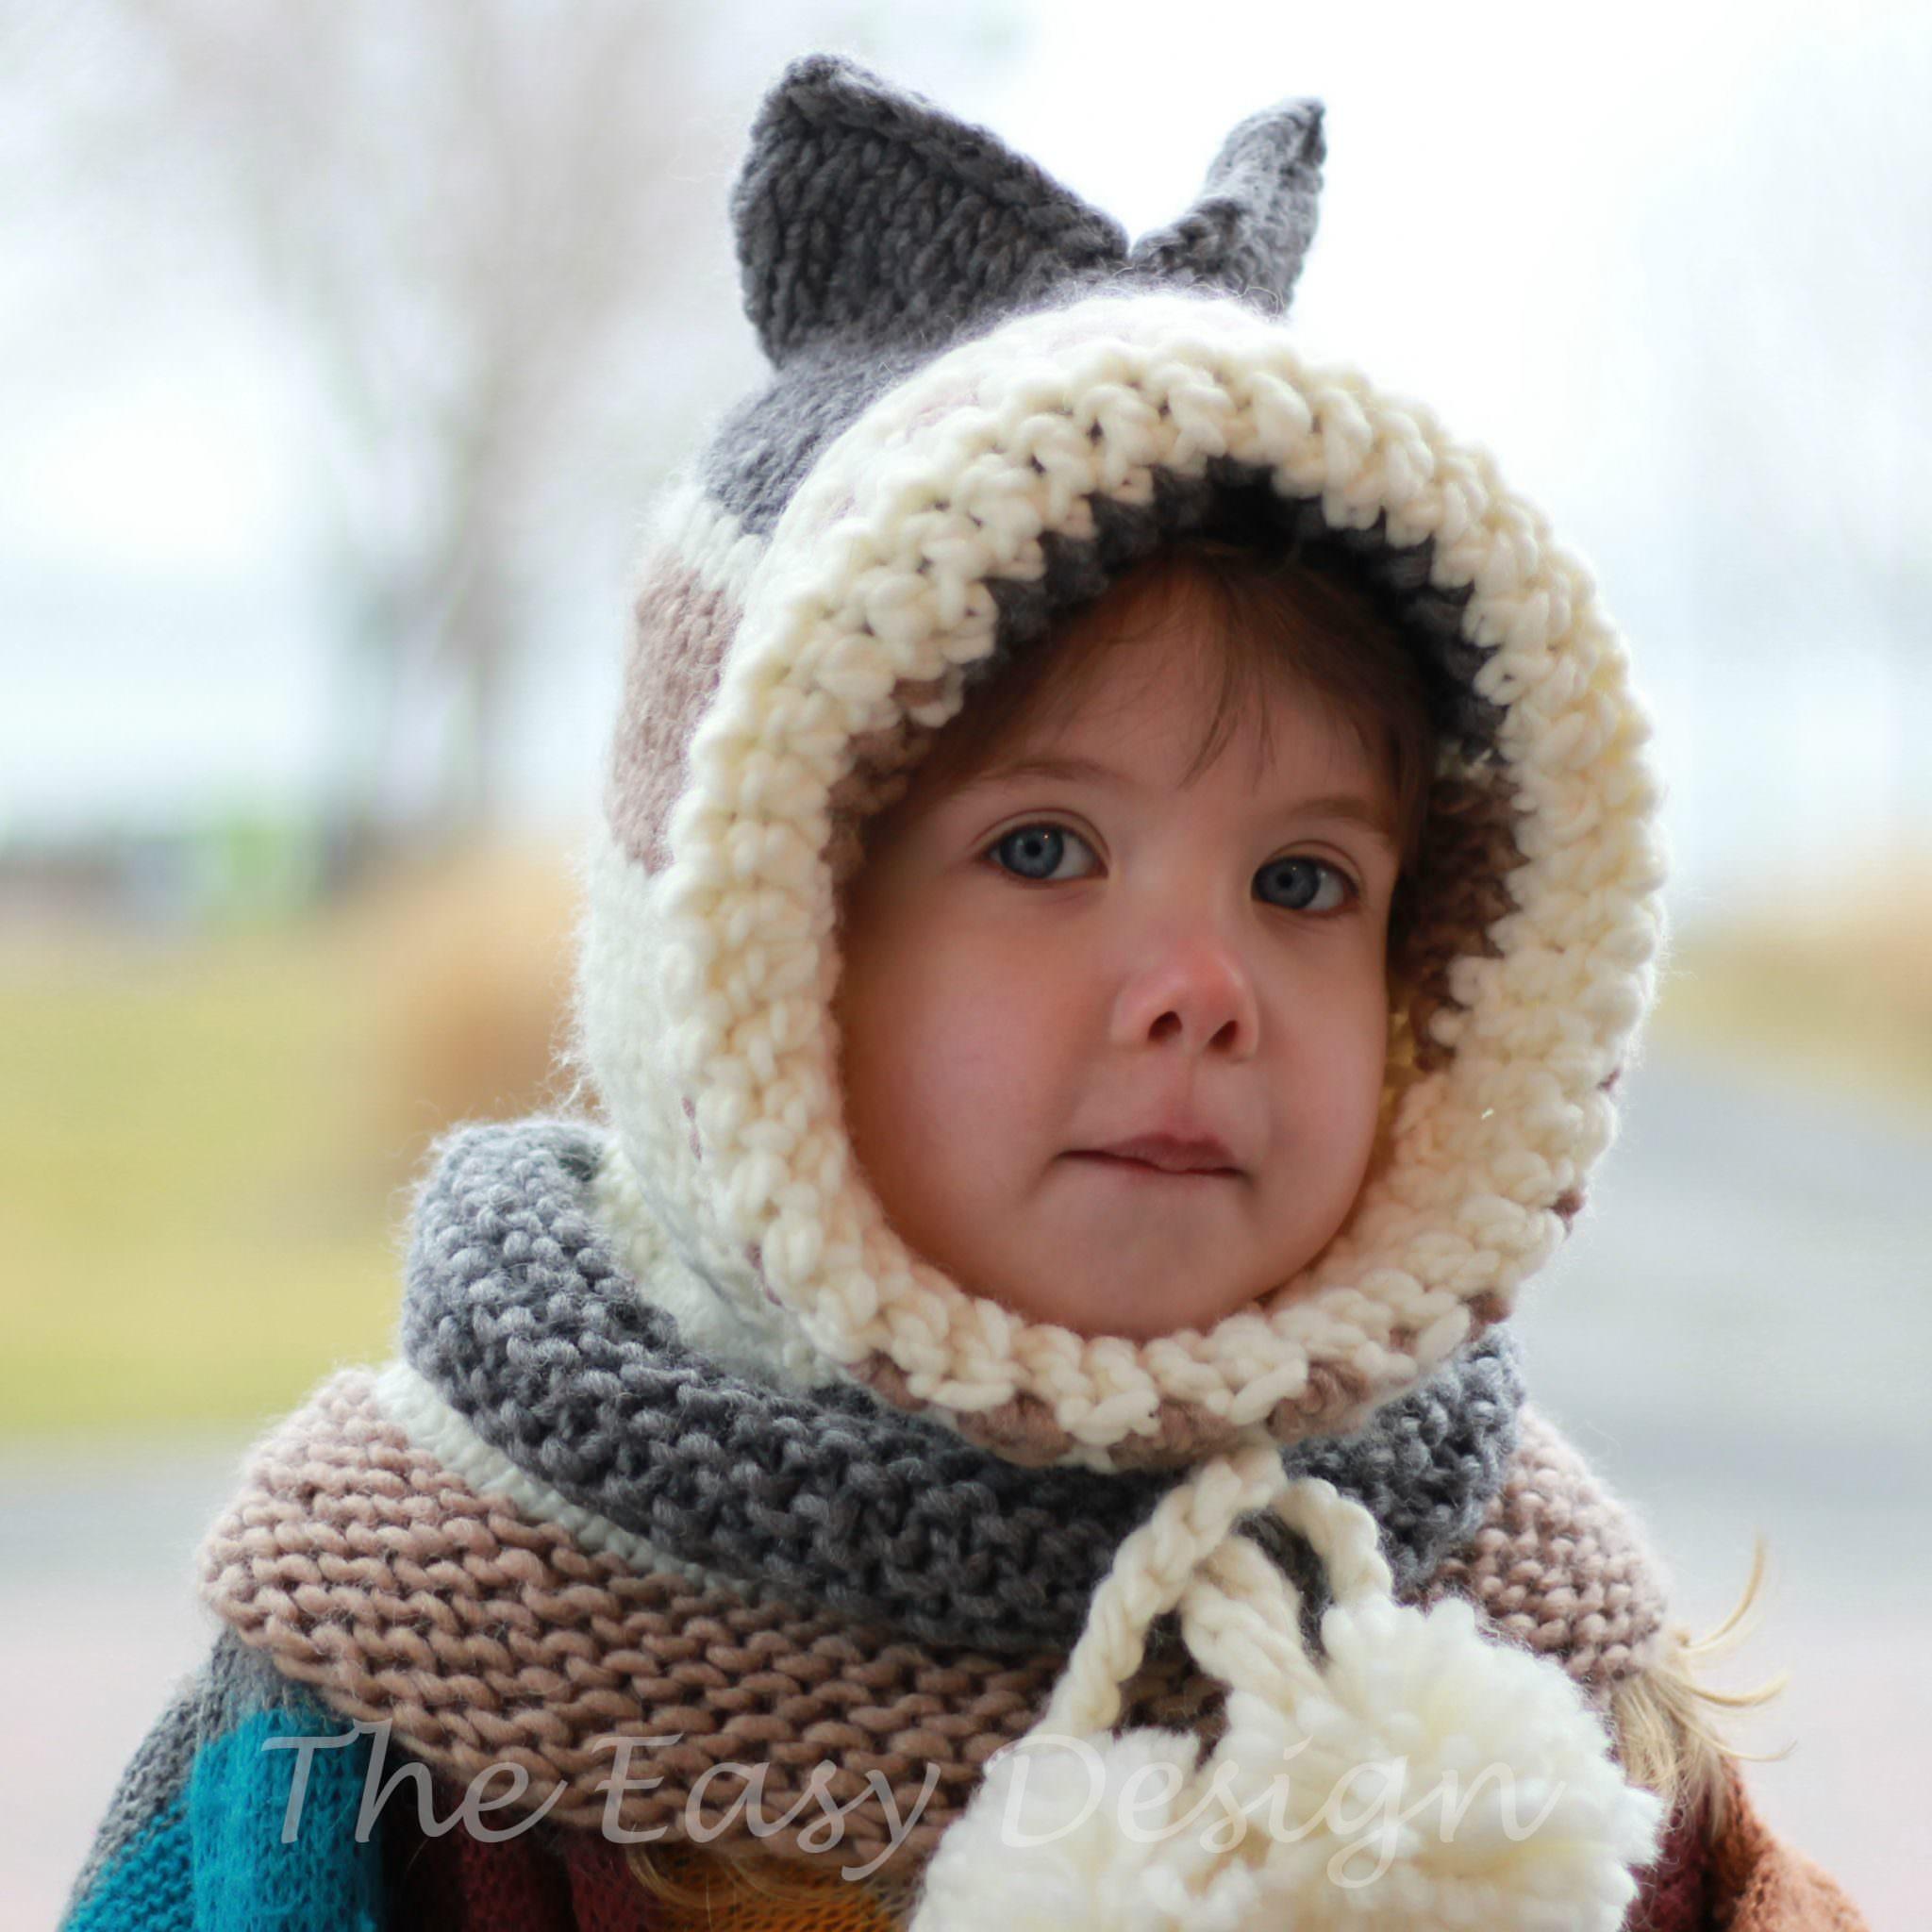 Karin Kitty Cat / Hooded Cowl - Knitting pattern - The Easy Design